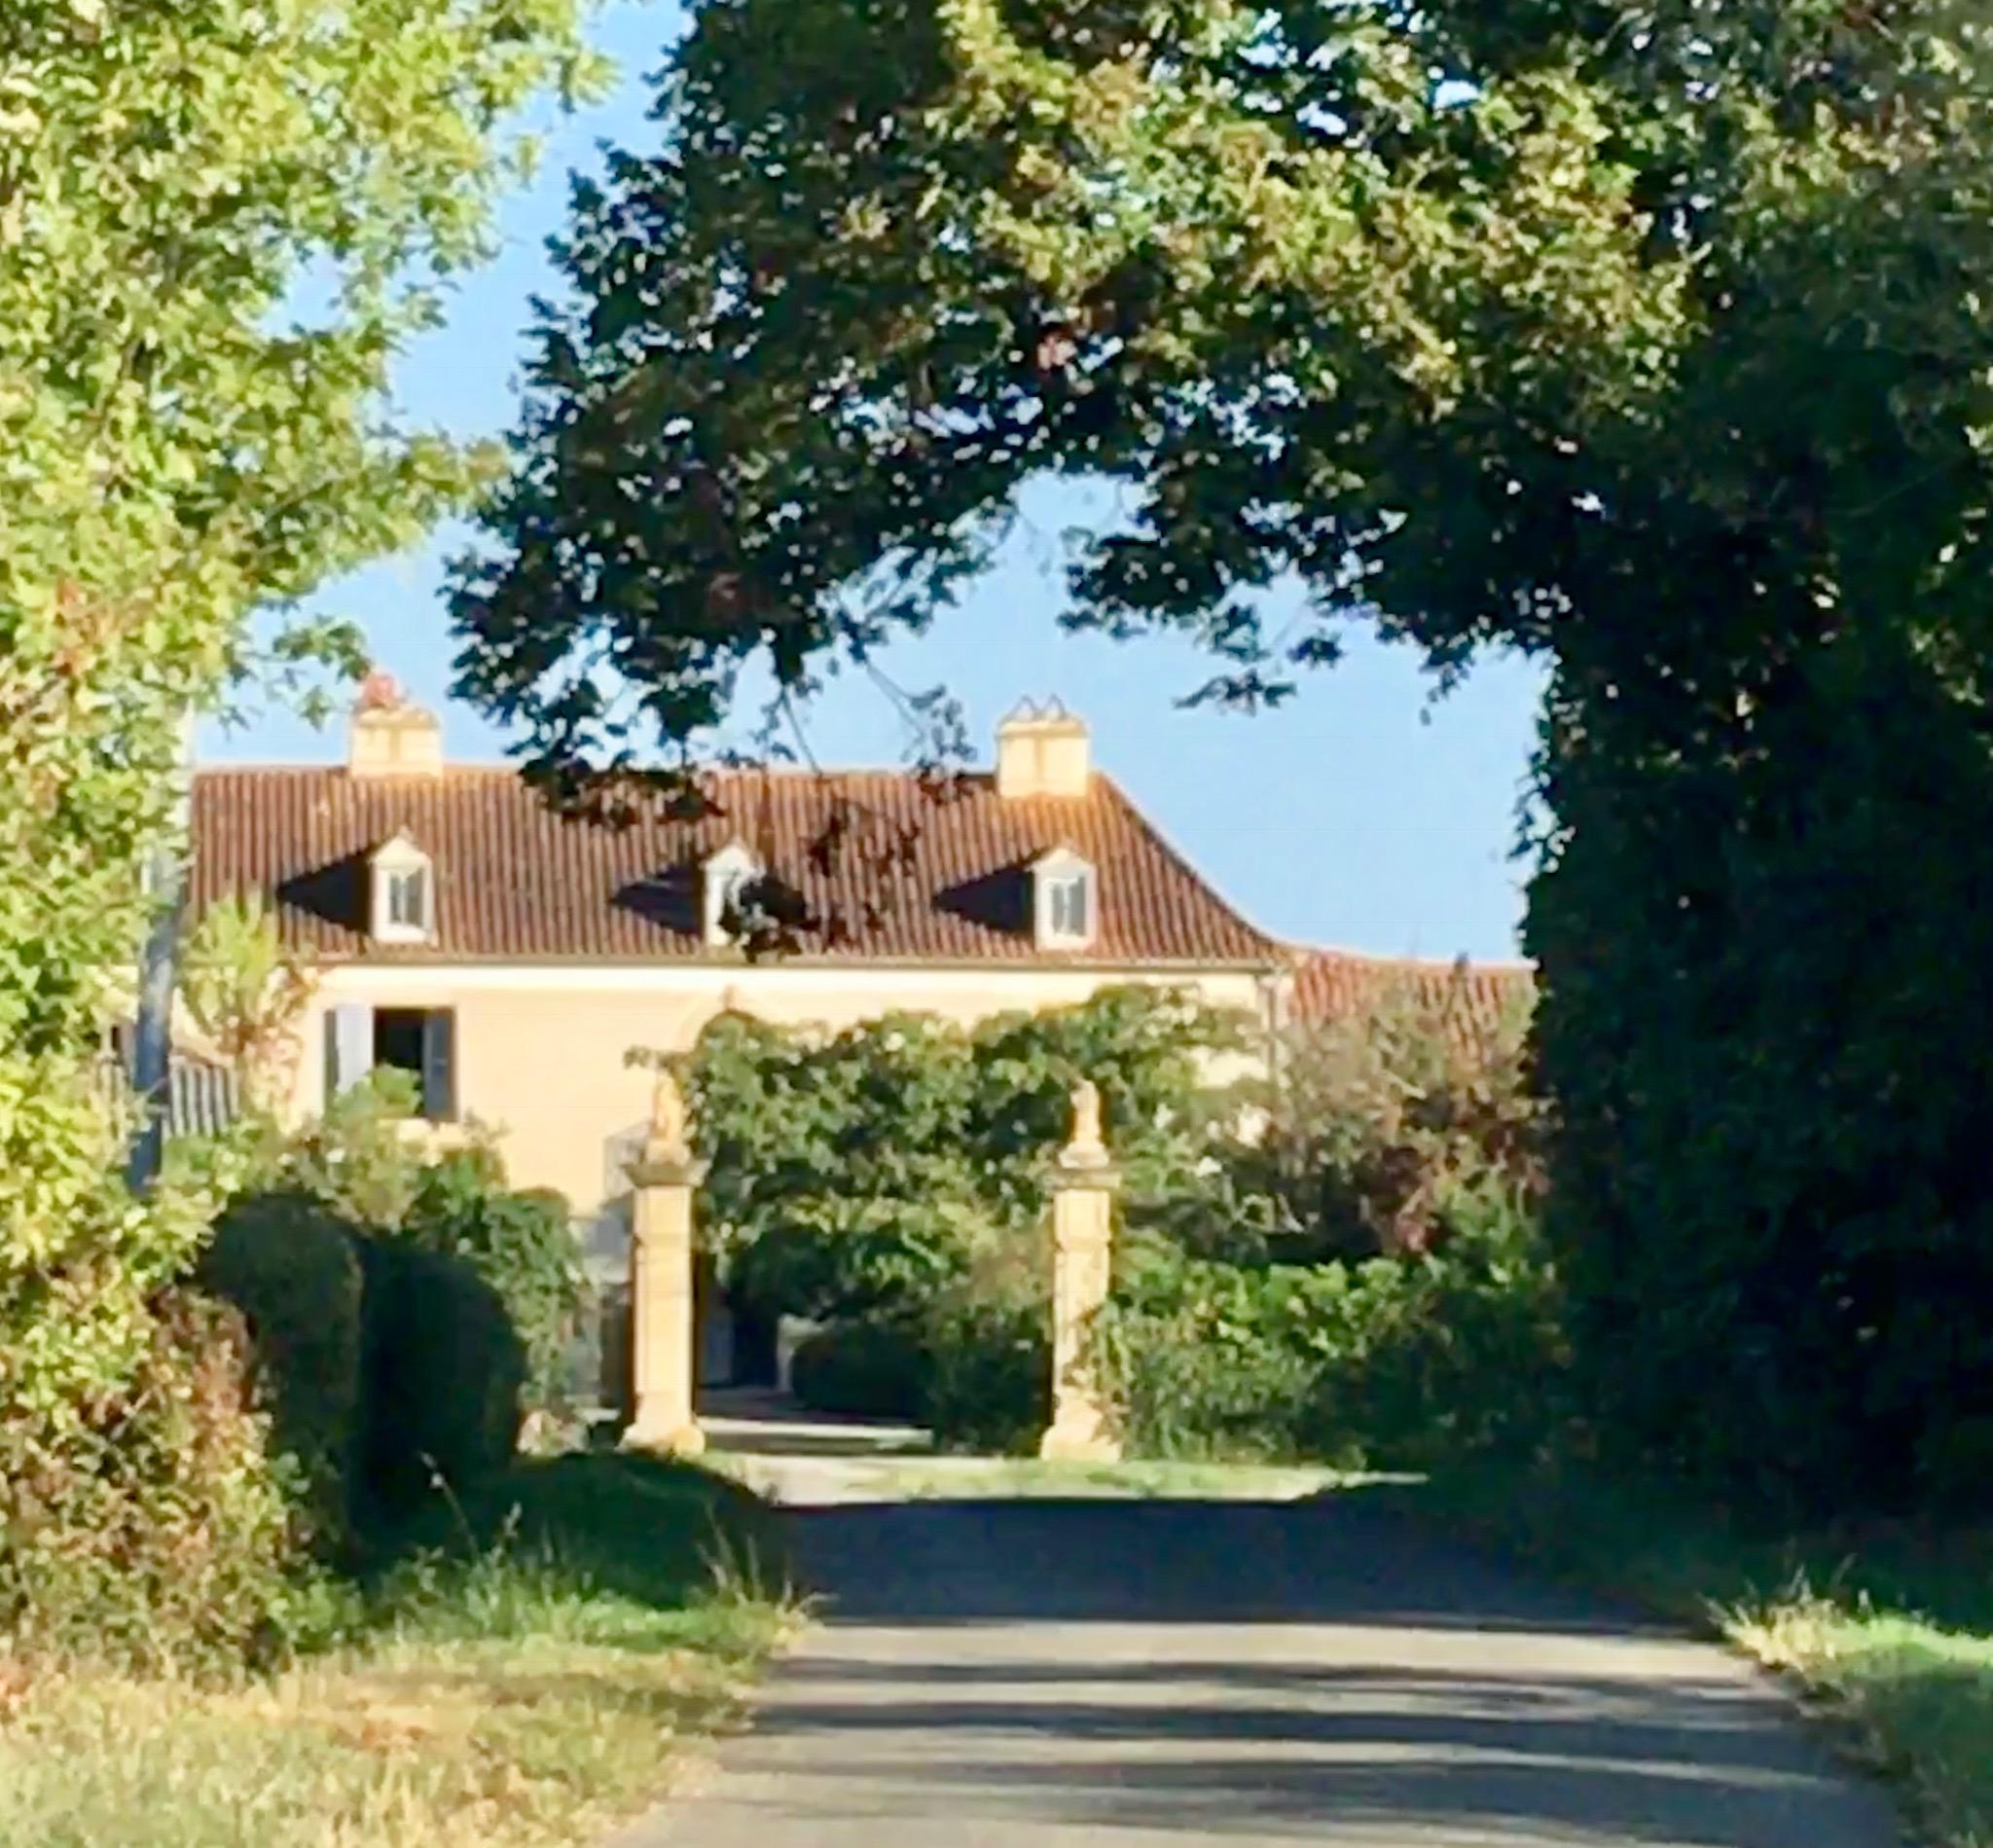 Property 6 | Domaine du Pignoulet, Gascony, France